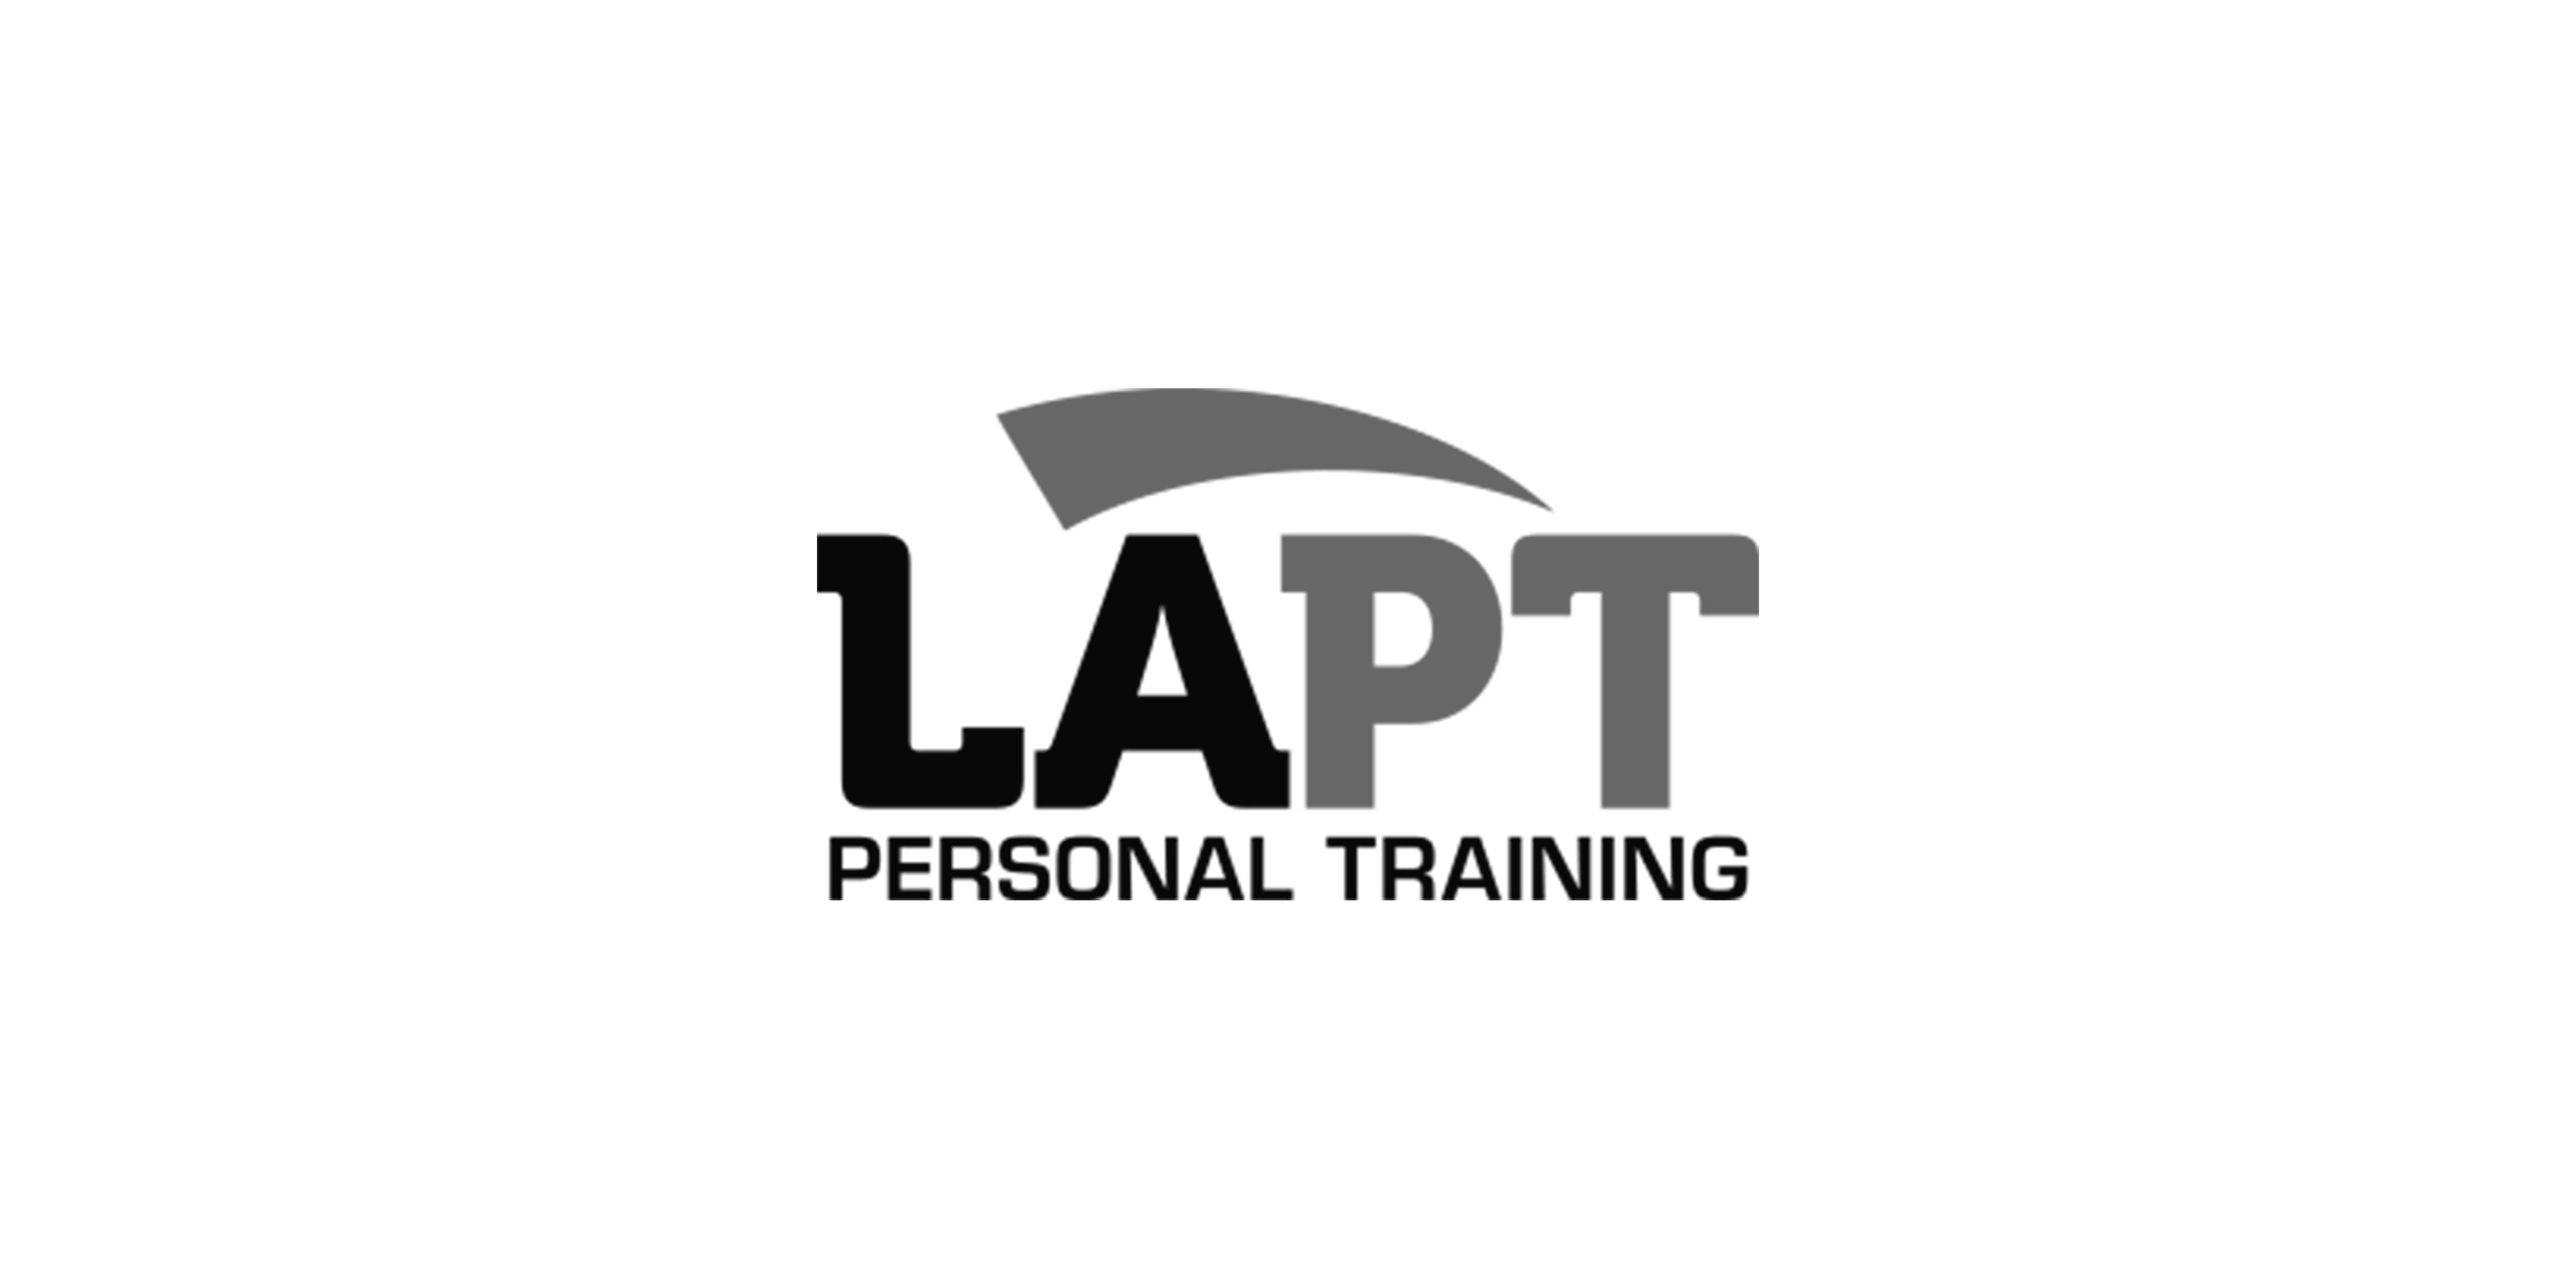 LAPT personal training logo Fitfair Jaarbeurs